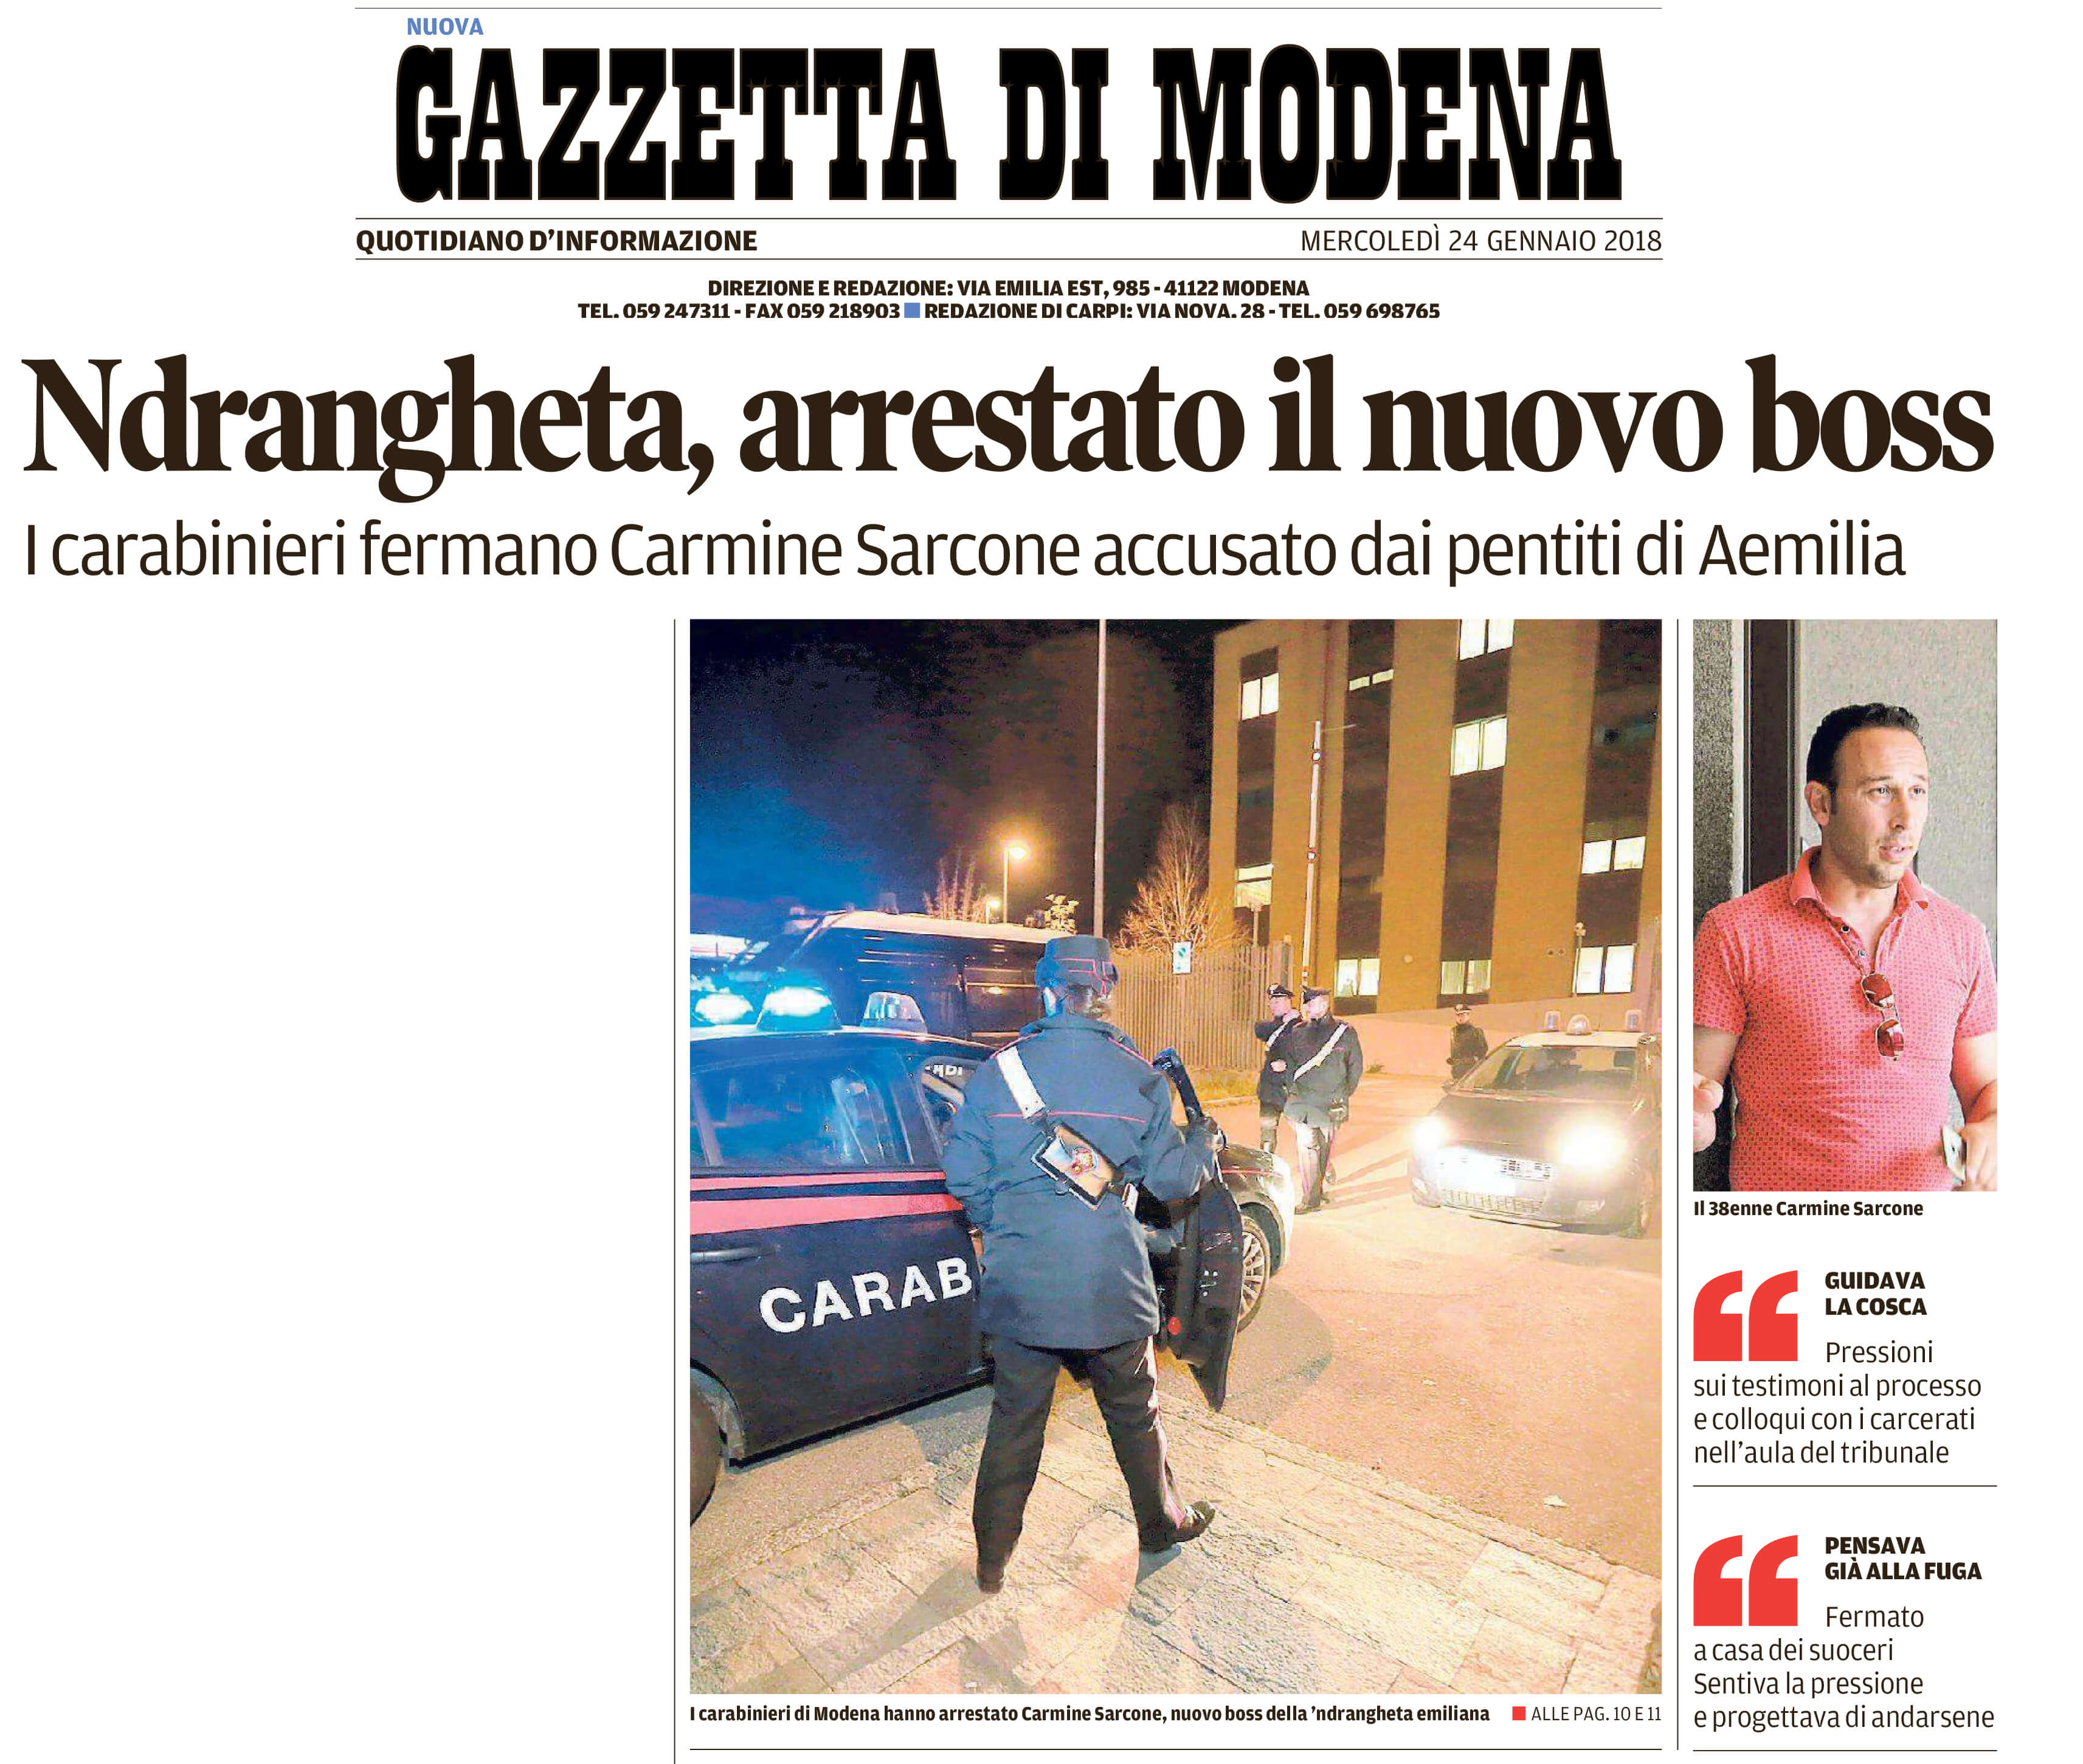 'Ndrangheta, arrestato!